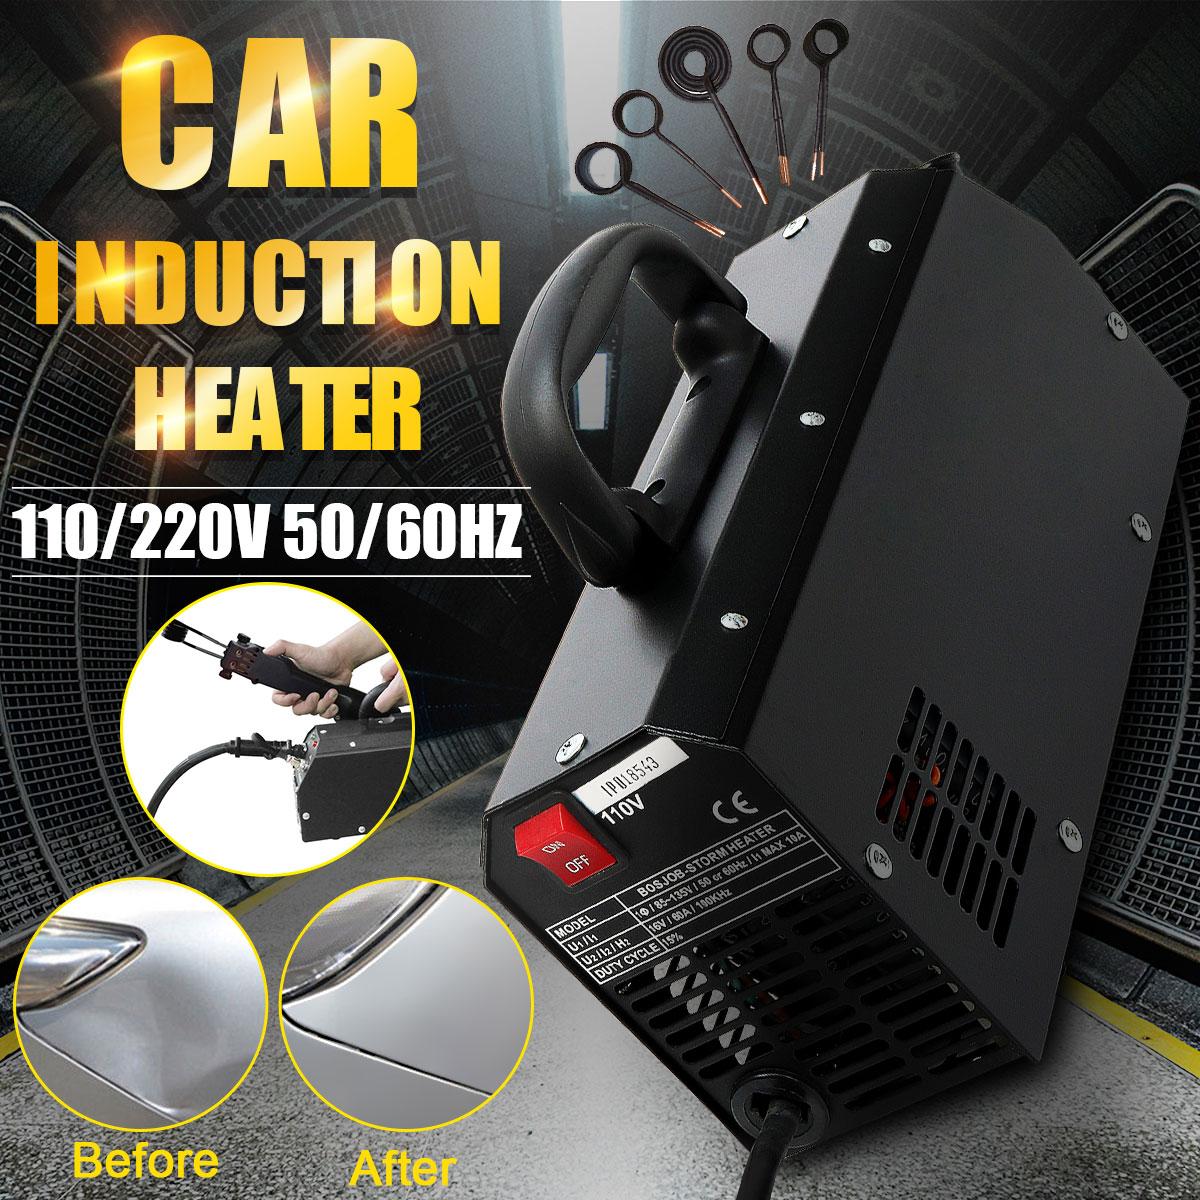 2000W 110V/220V Induction Heater Paintless Dent Repair Remover PDR Induction Heater Hot Box Remover